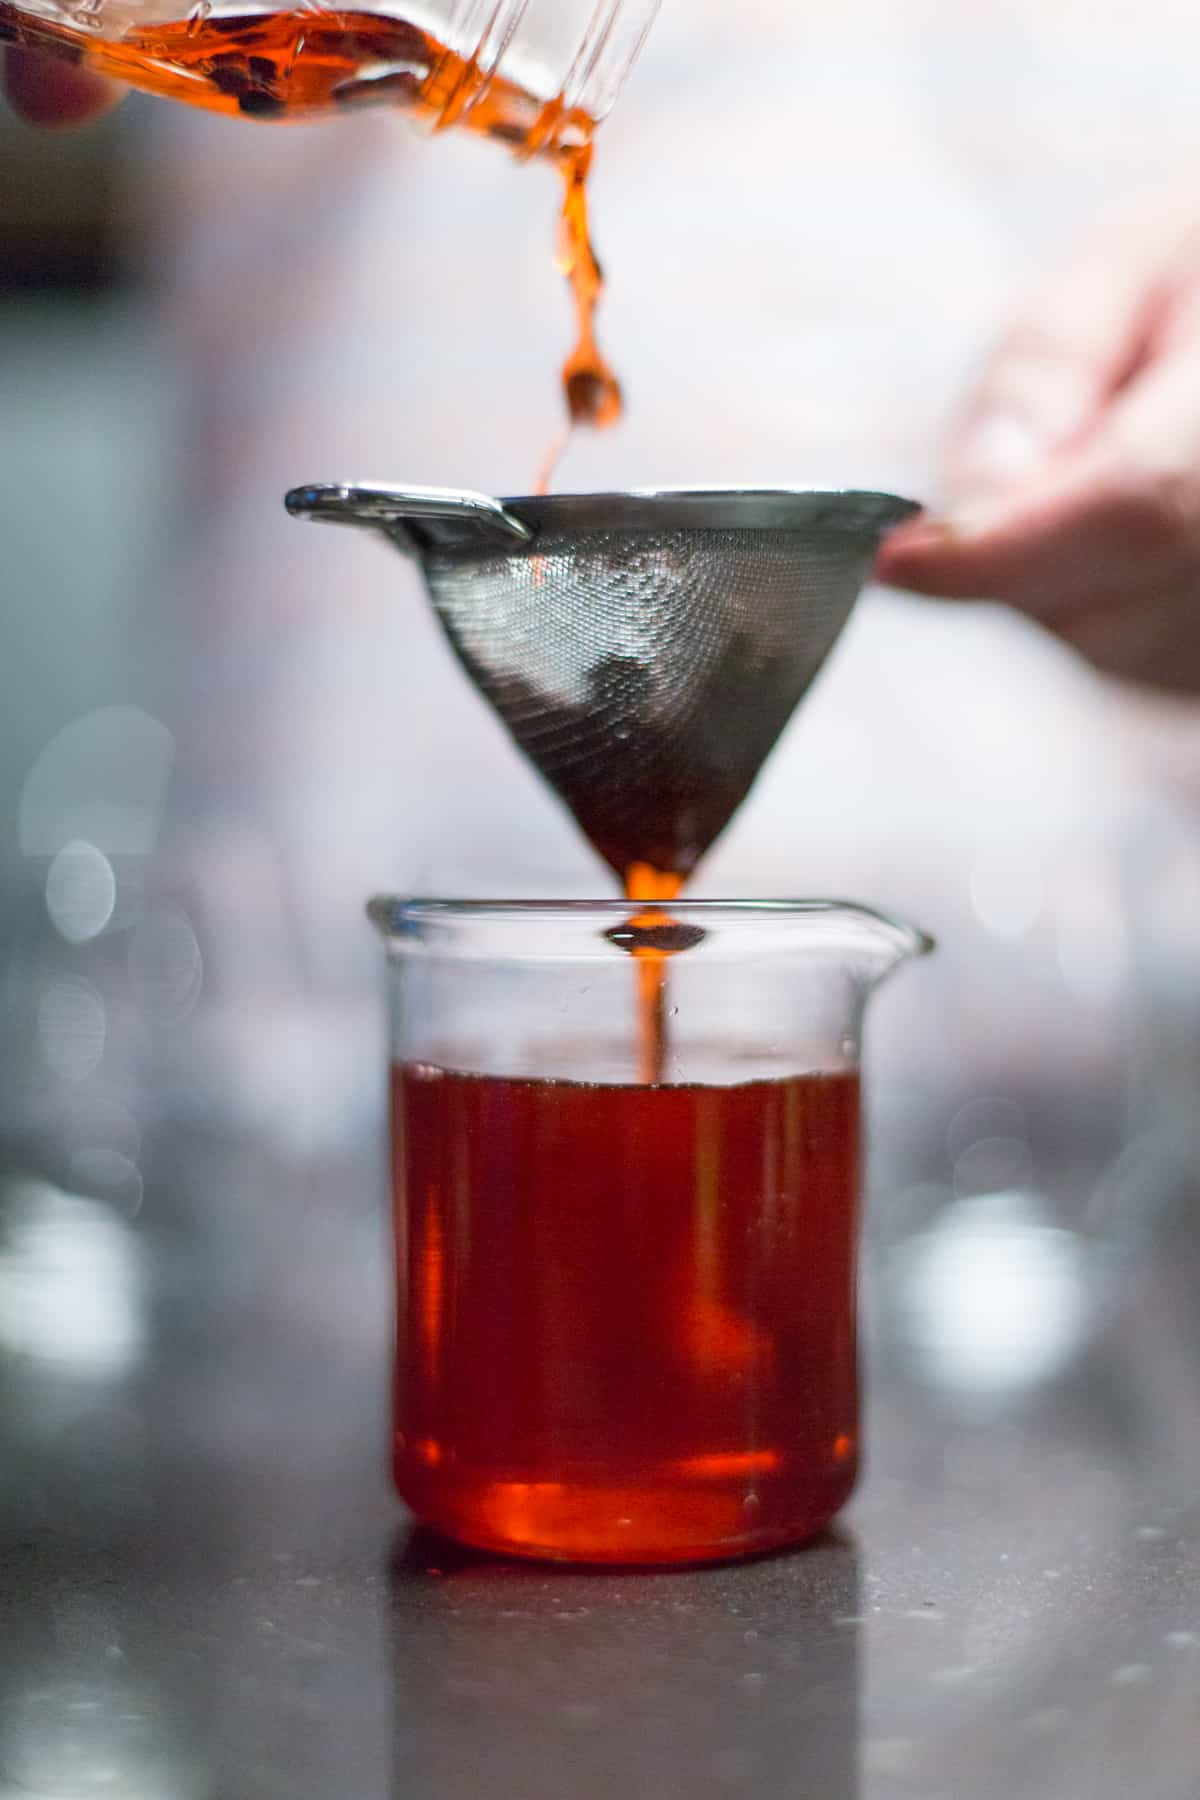 straining drink